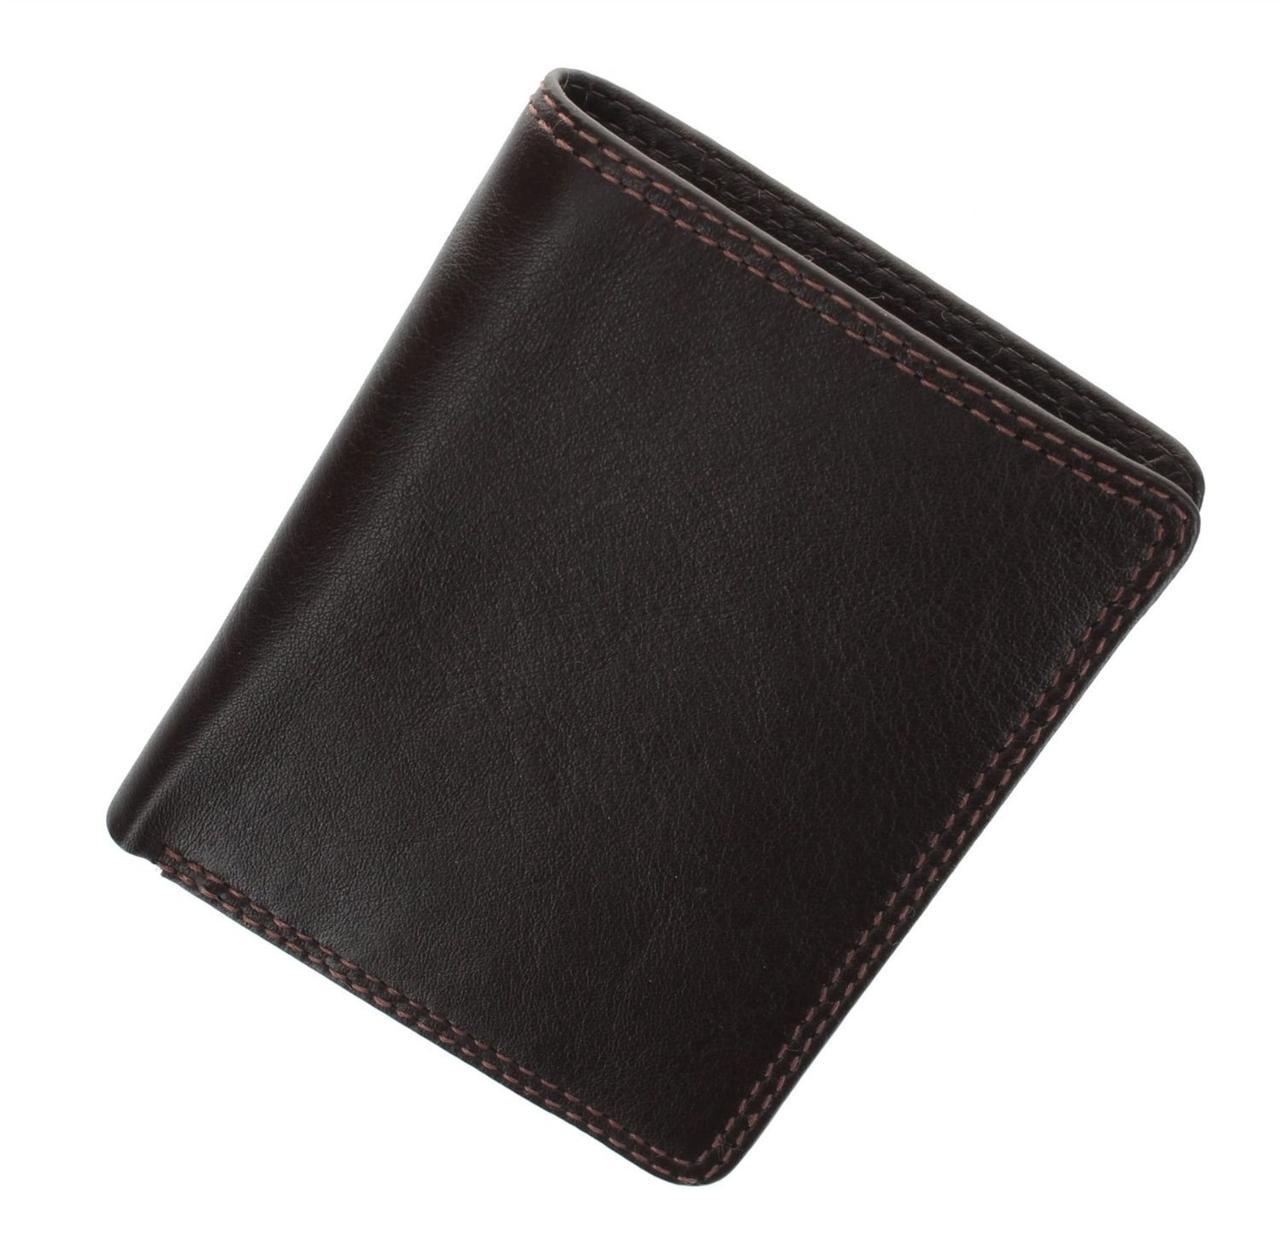 Маленький кошелек Visconti HT6 brown (Великобритания)